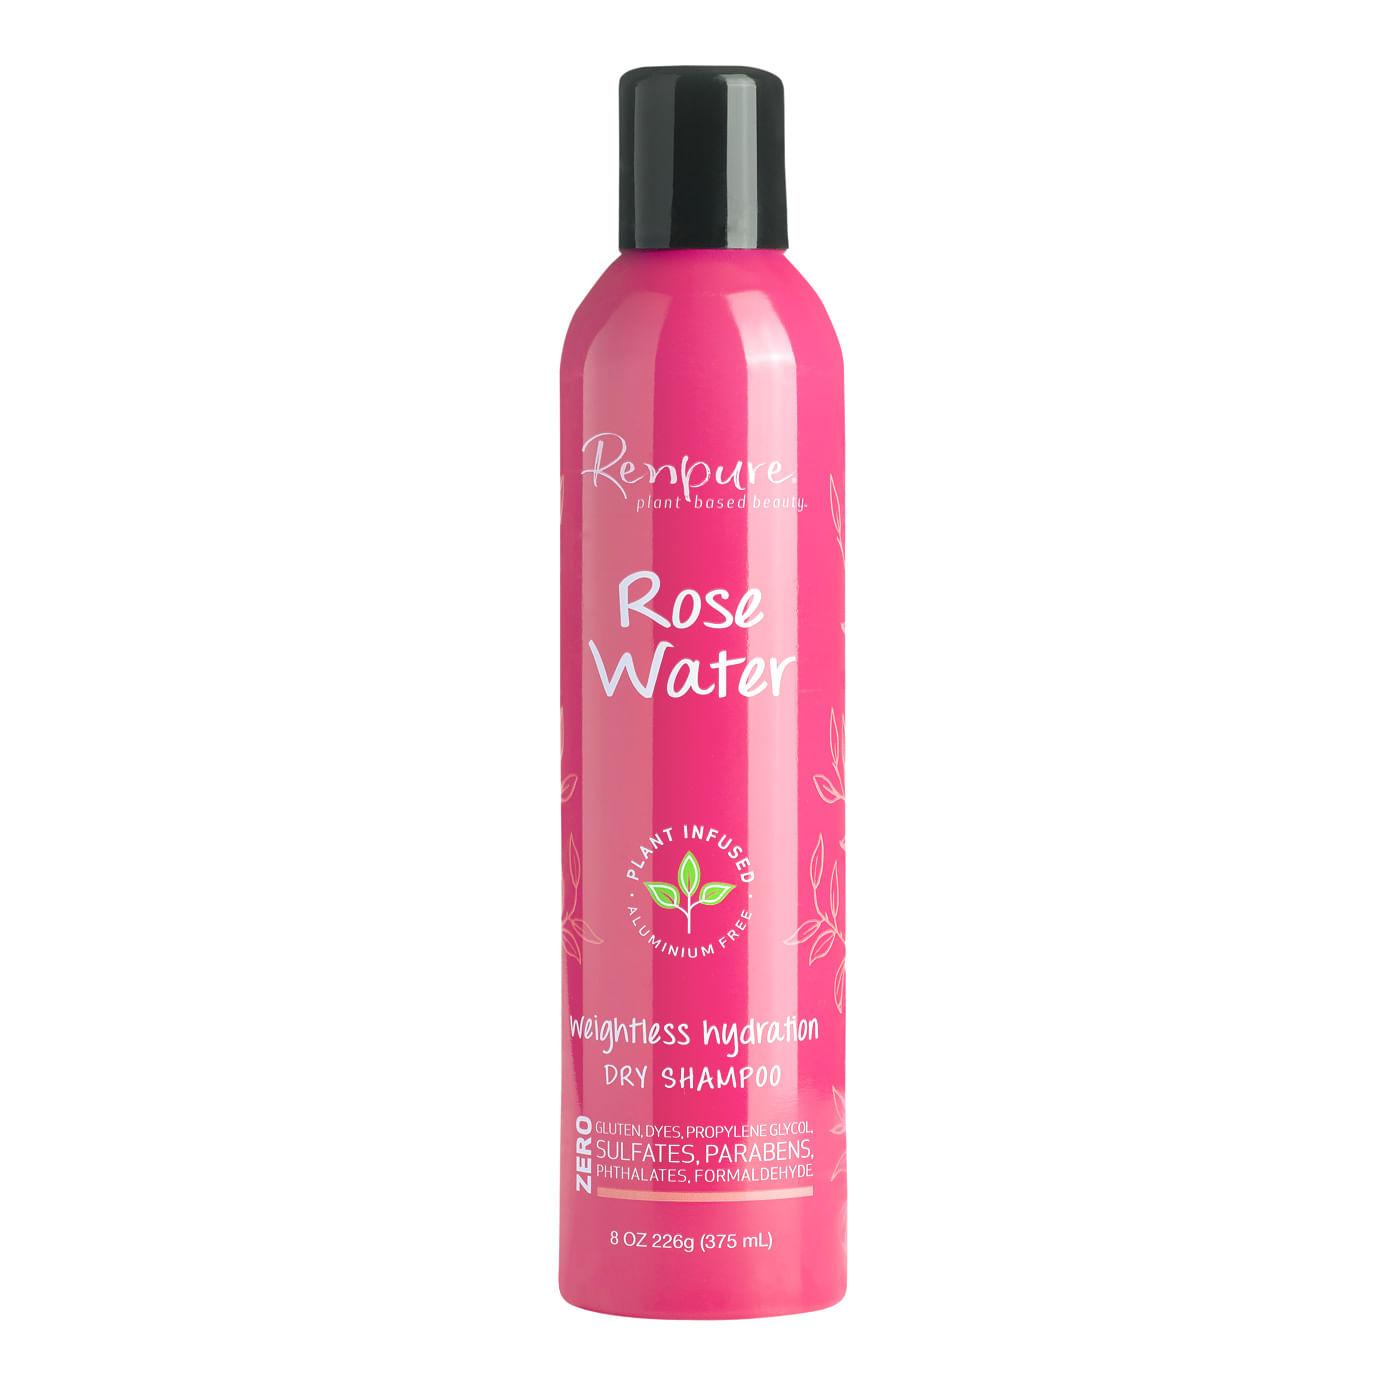 Shampoo Renpure Rose Water dry 8oz